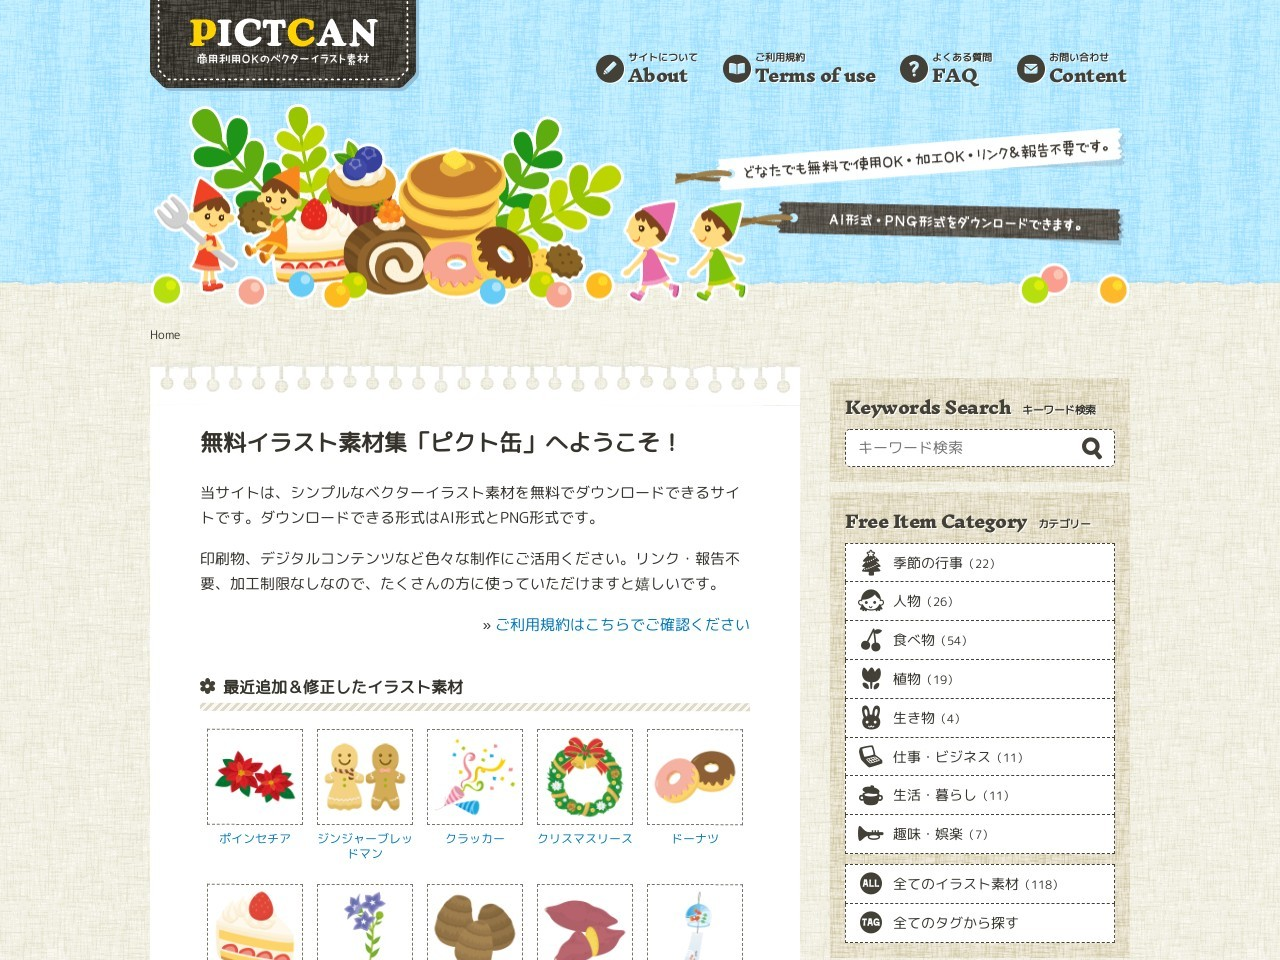 http://www.pictcan.com/item/0072.html